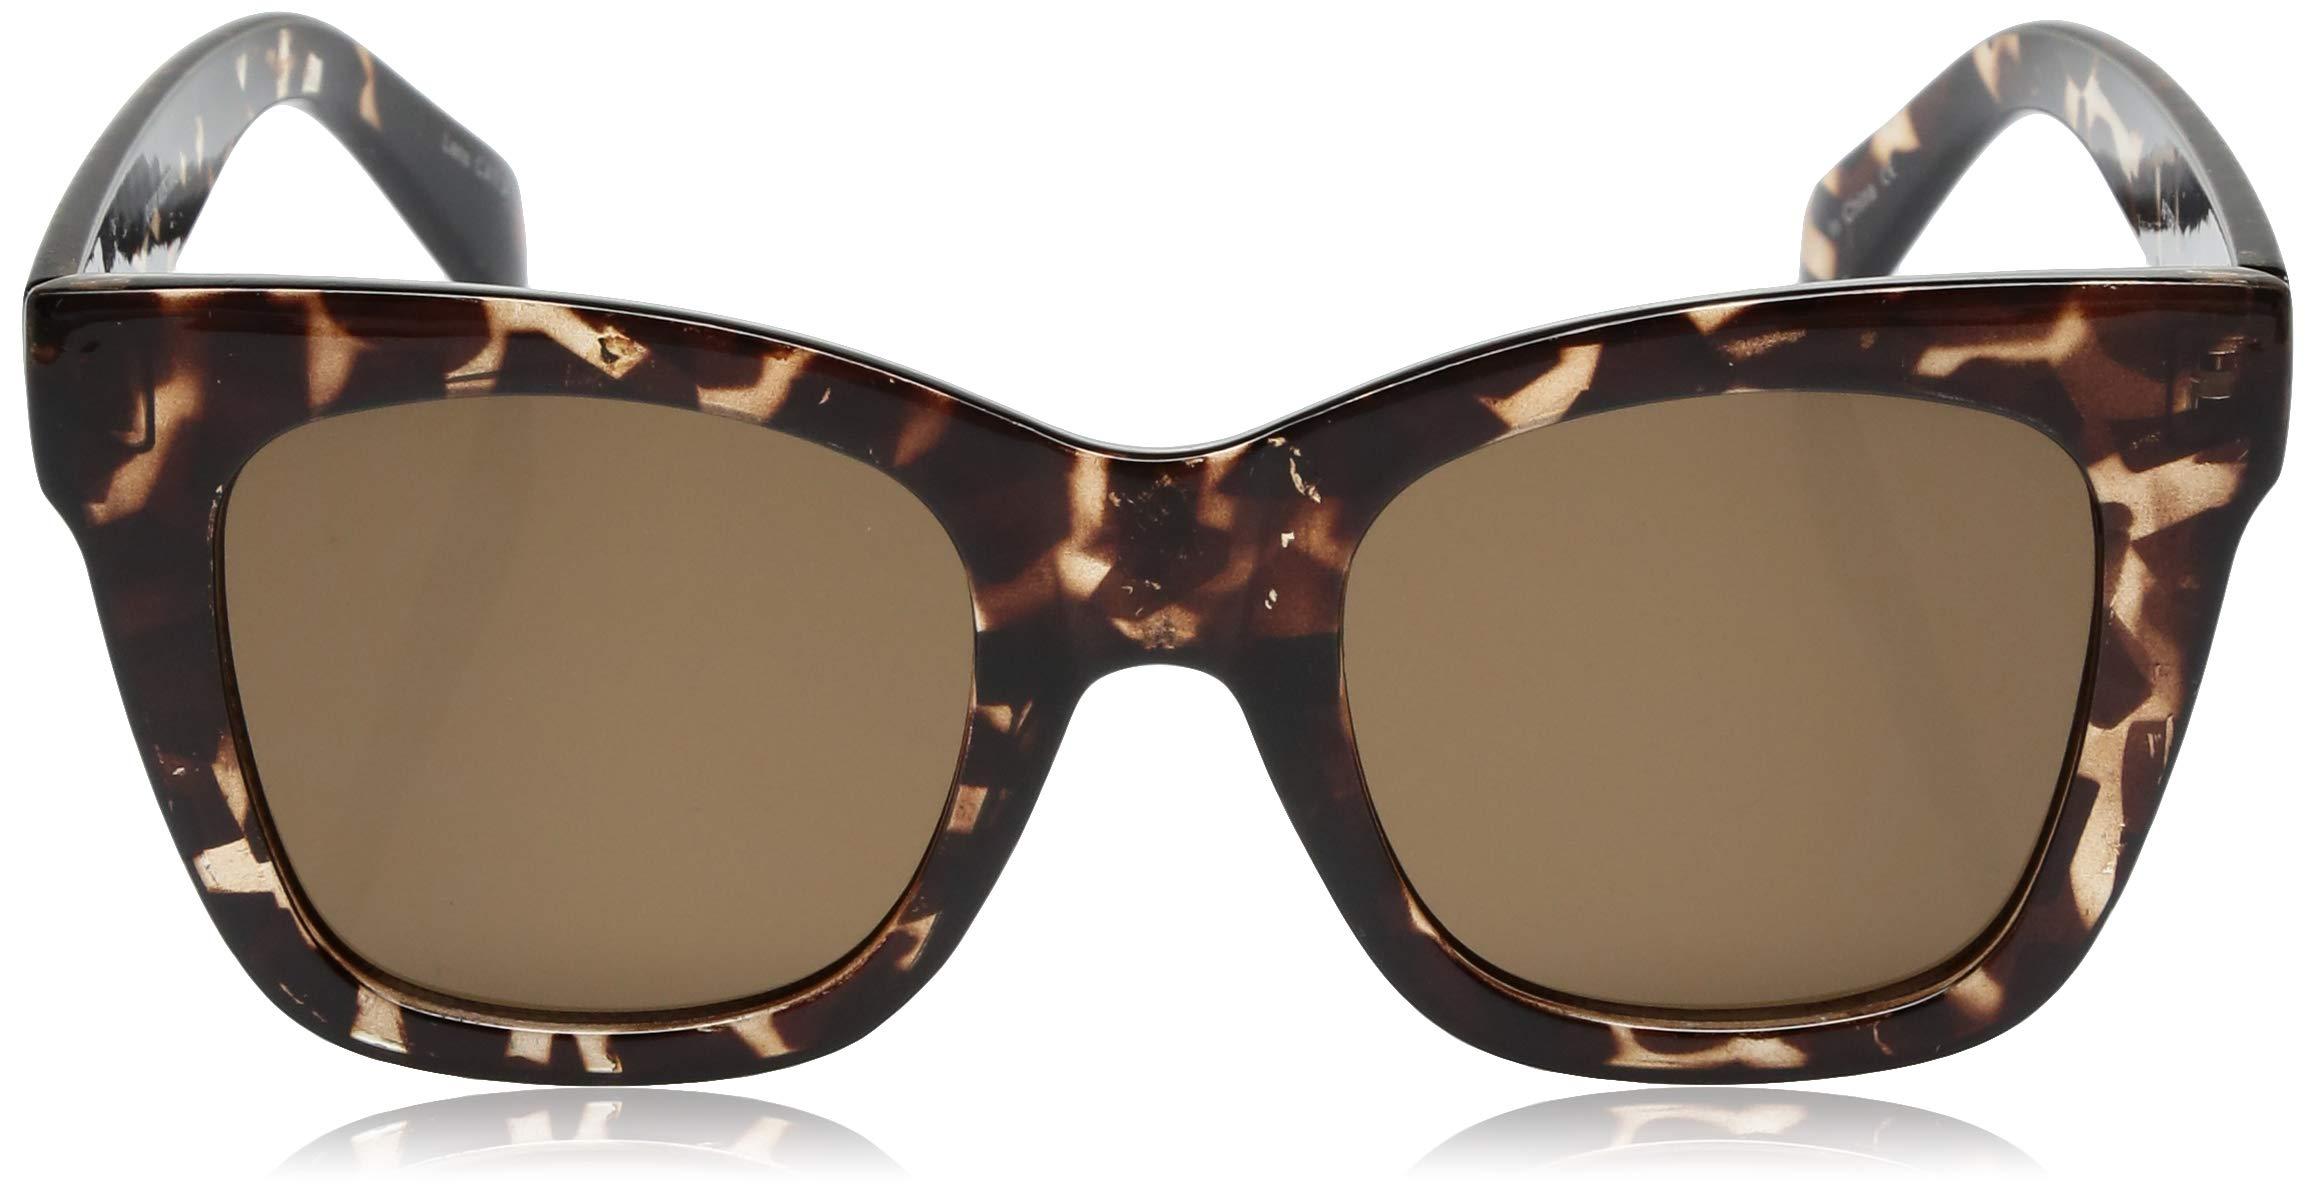 Quay Women's After Hours Sunglasses